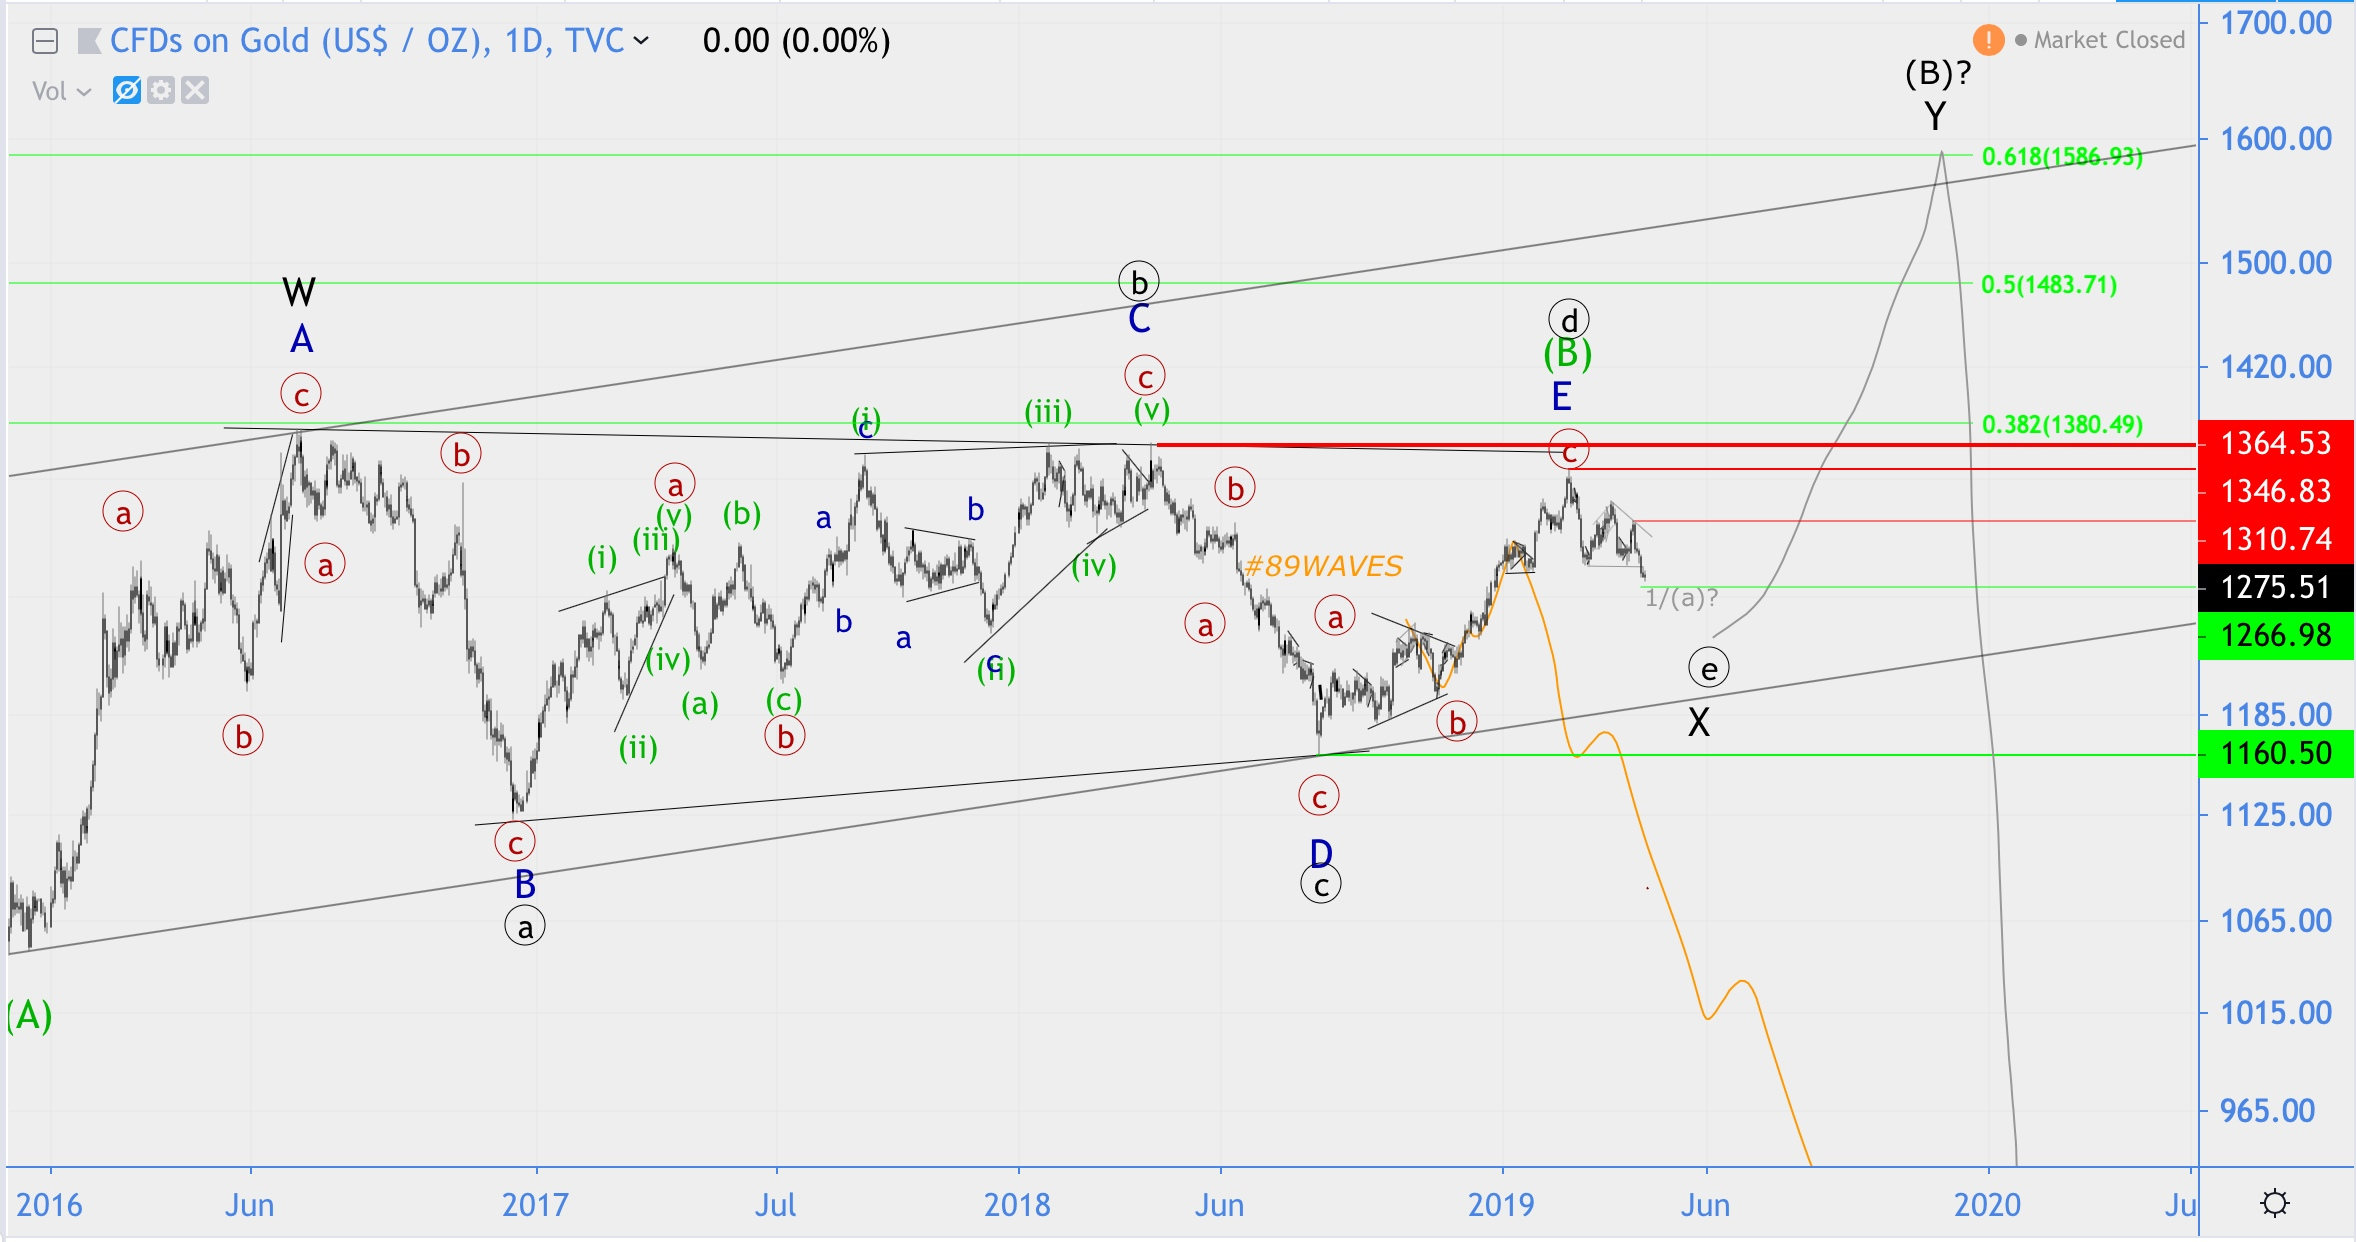 Волновой анализ GBP/JPY, Золото, Нефть (+Хронология)